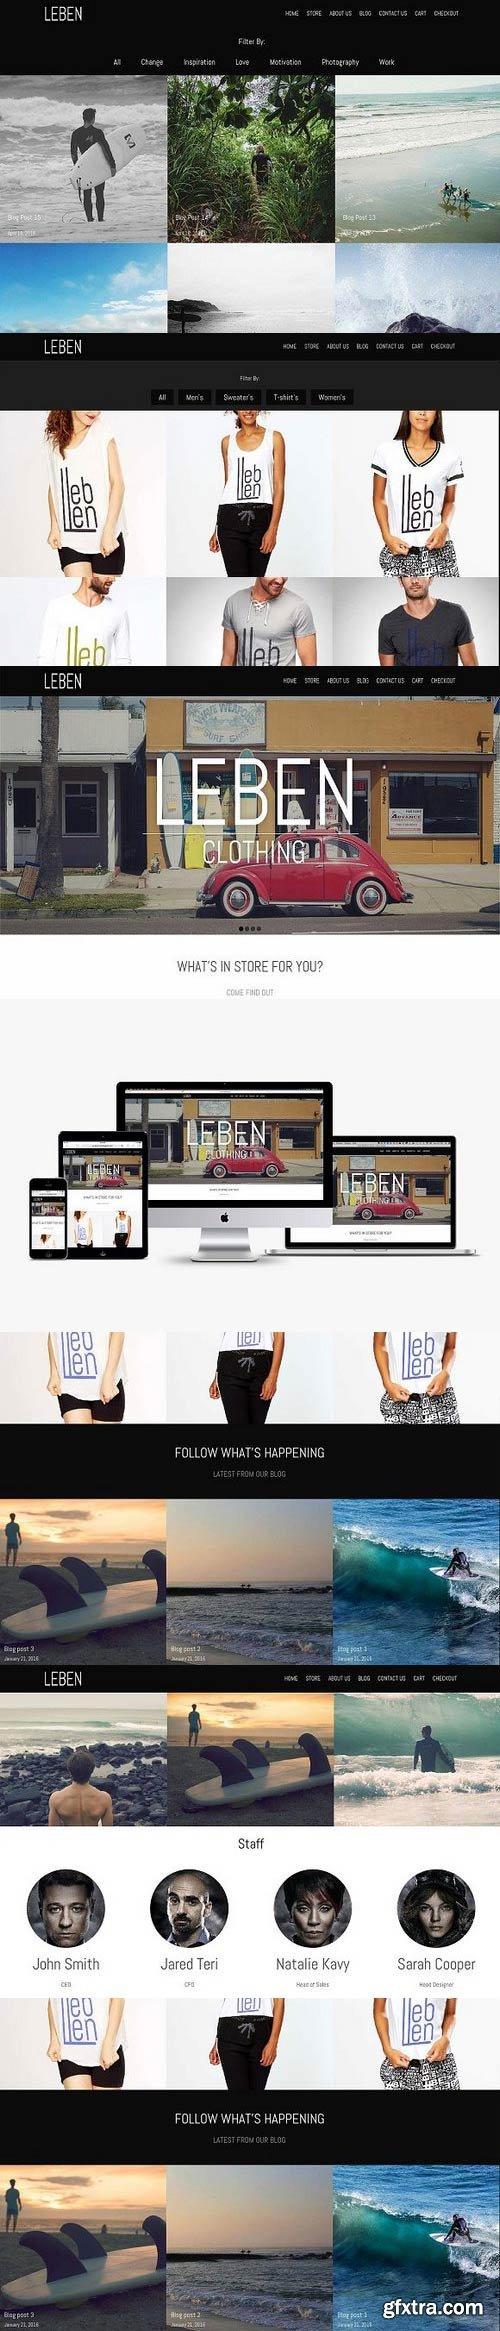 CM 700386 - Leben Theme Bundle for eCommerce